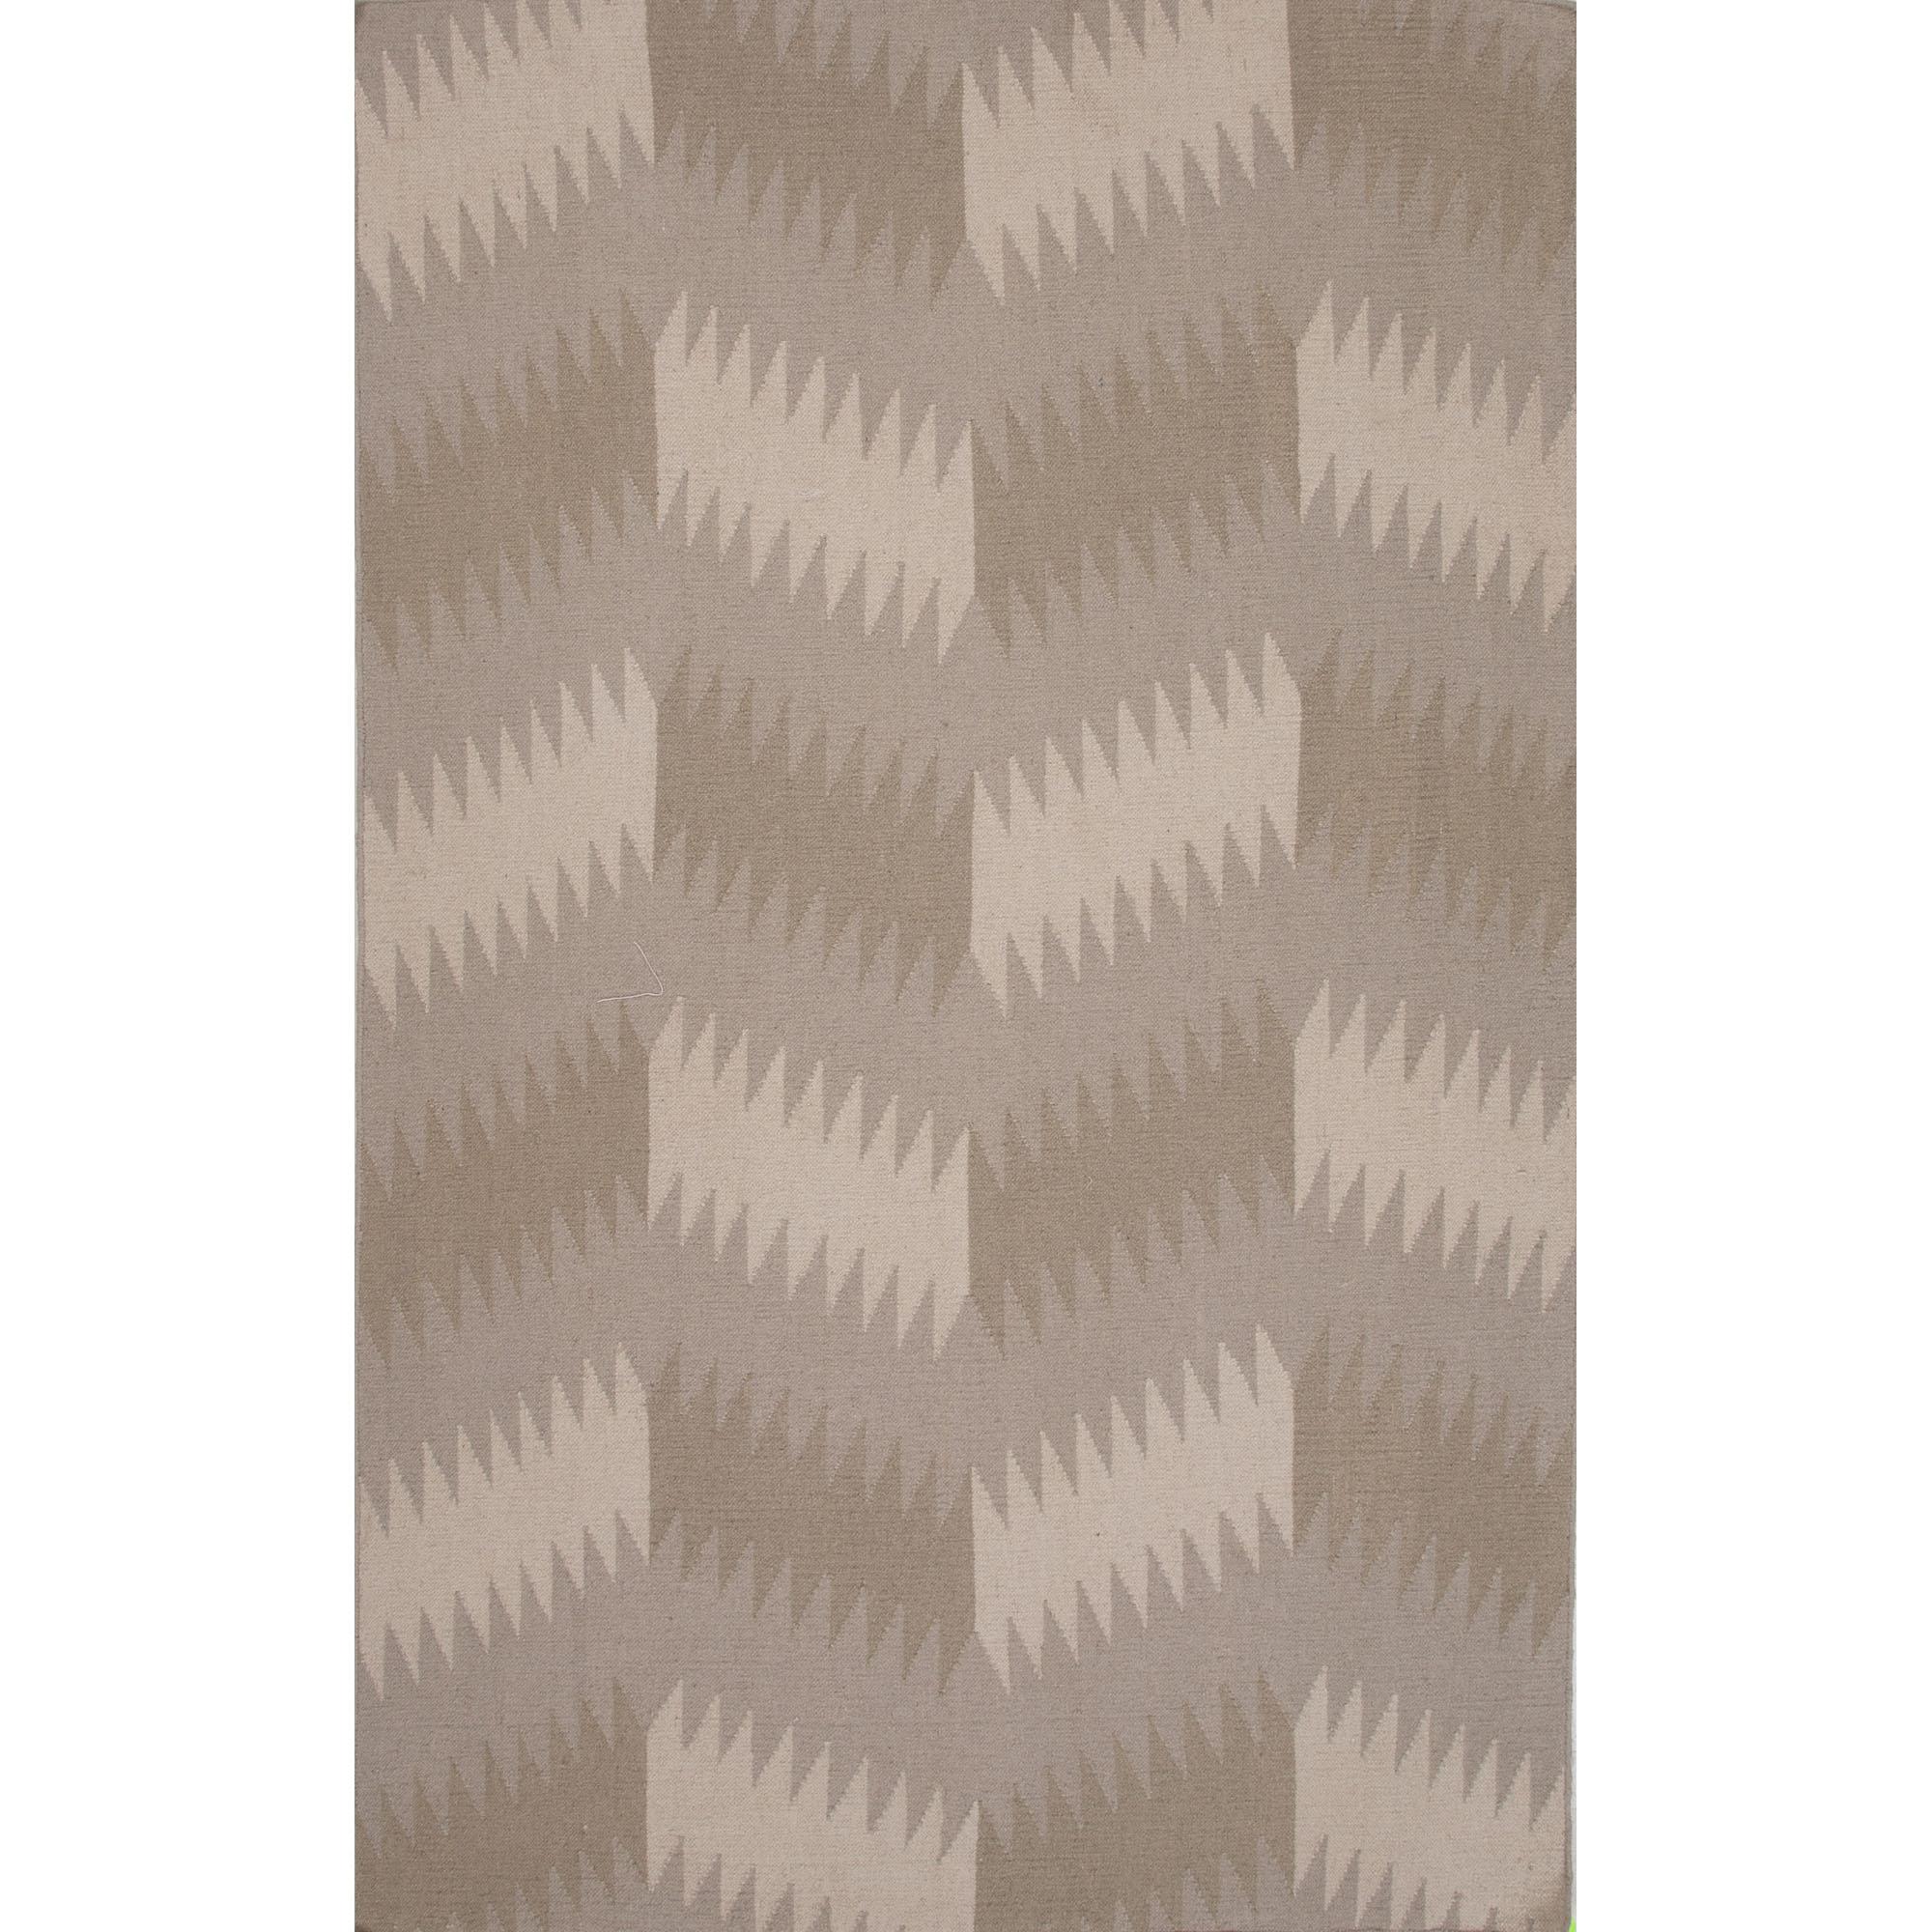 JAIPUR Rugs Traditions Modern Flat Weave 2 x 3 Rug - Item Number: RUG122244